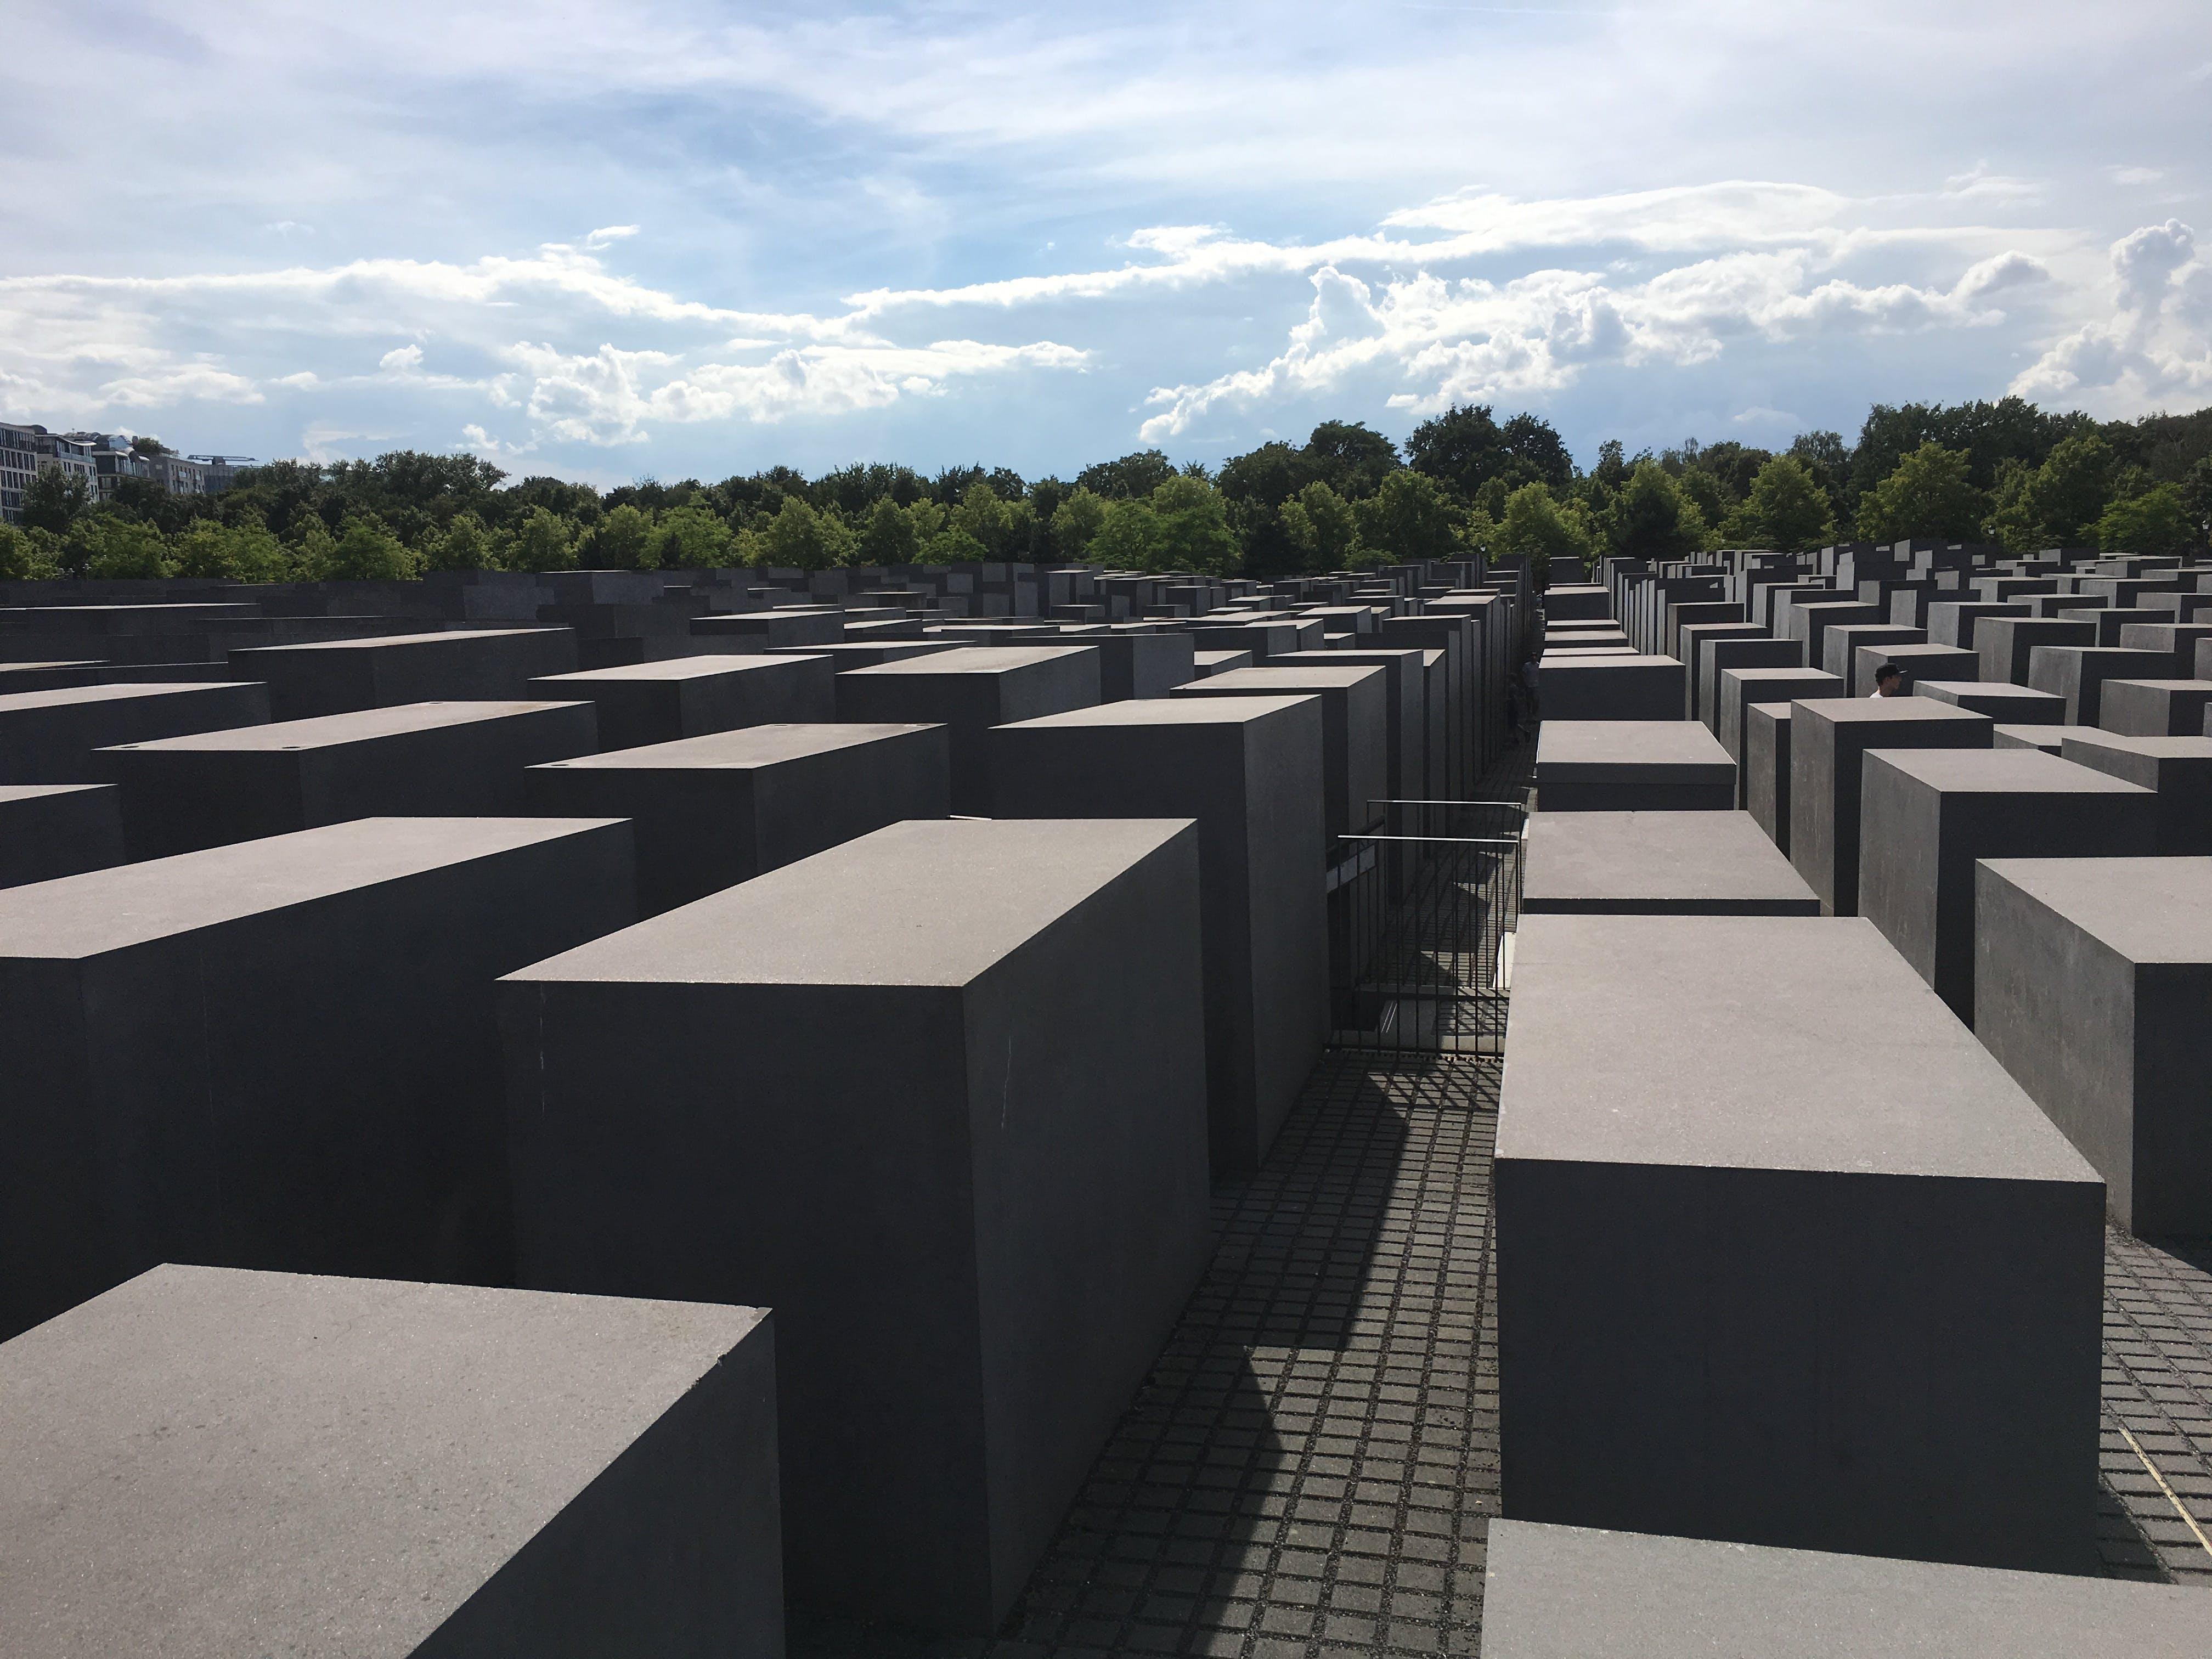 Free stock photo of berlin, deutschland, europe, germany